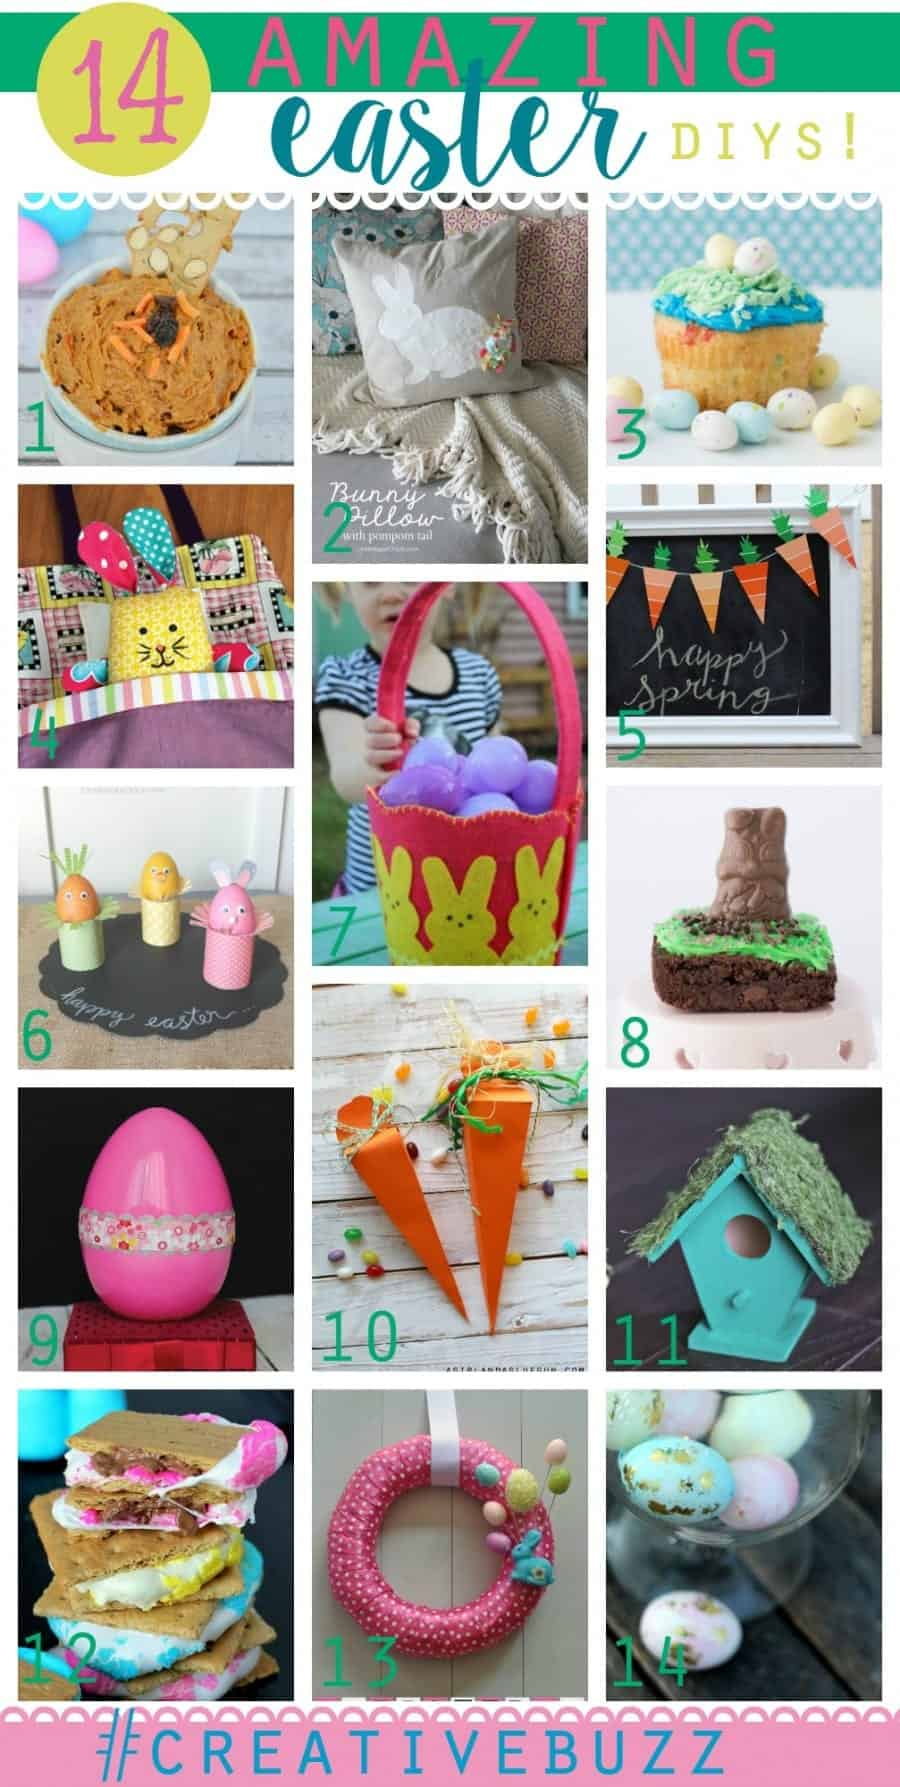 easter diy collage #creativebuzz treats, decor, games, crafts